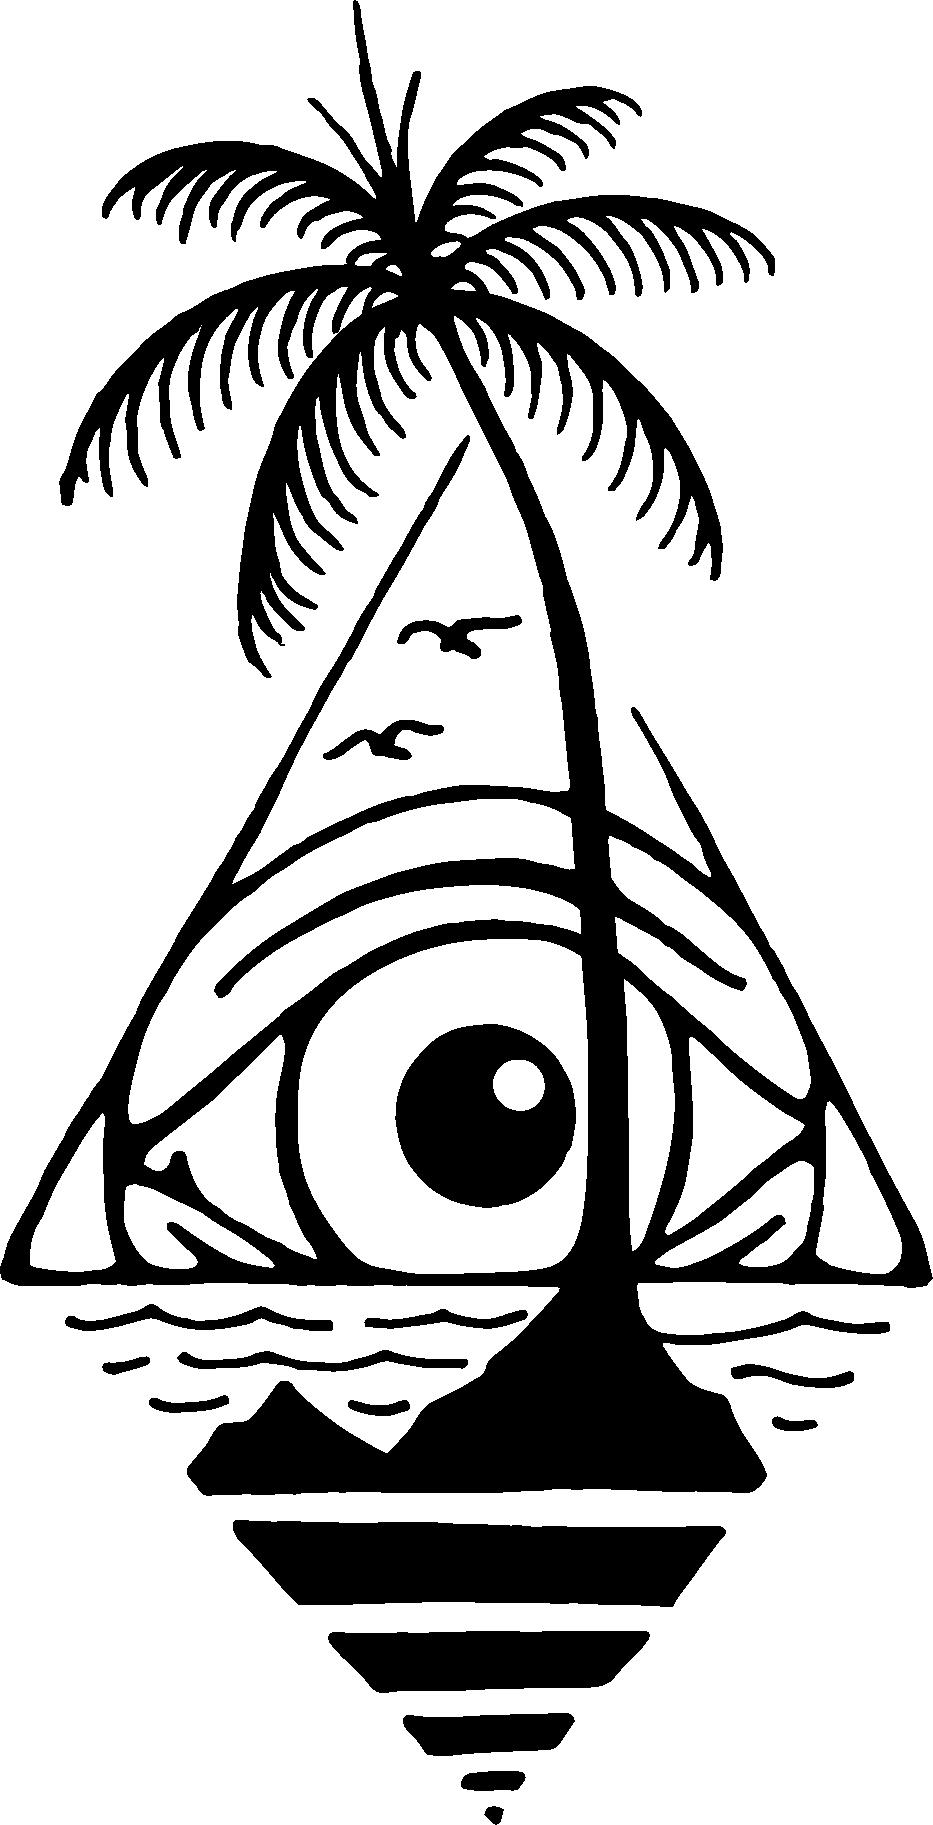 IslandEye_logo_graphic_notext.png